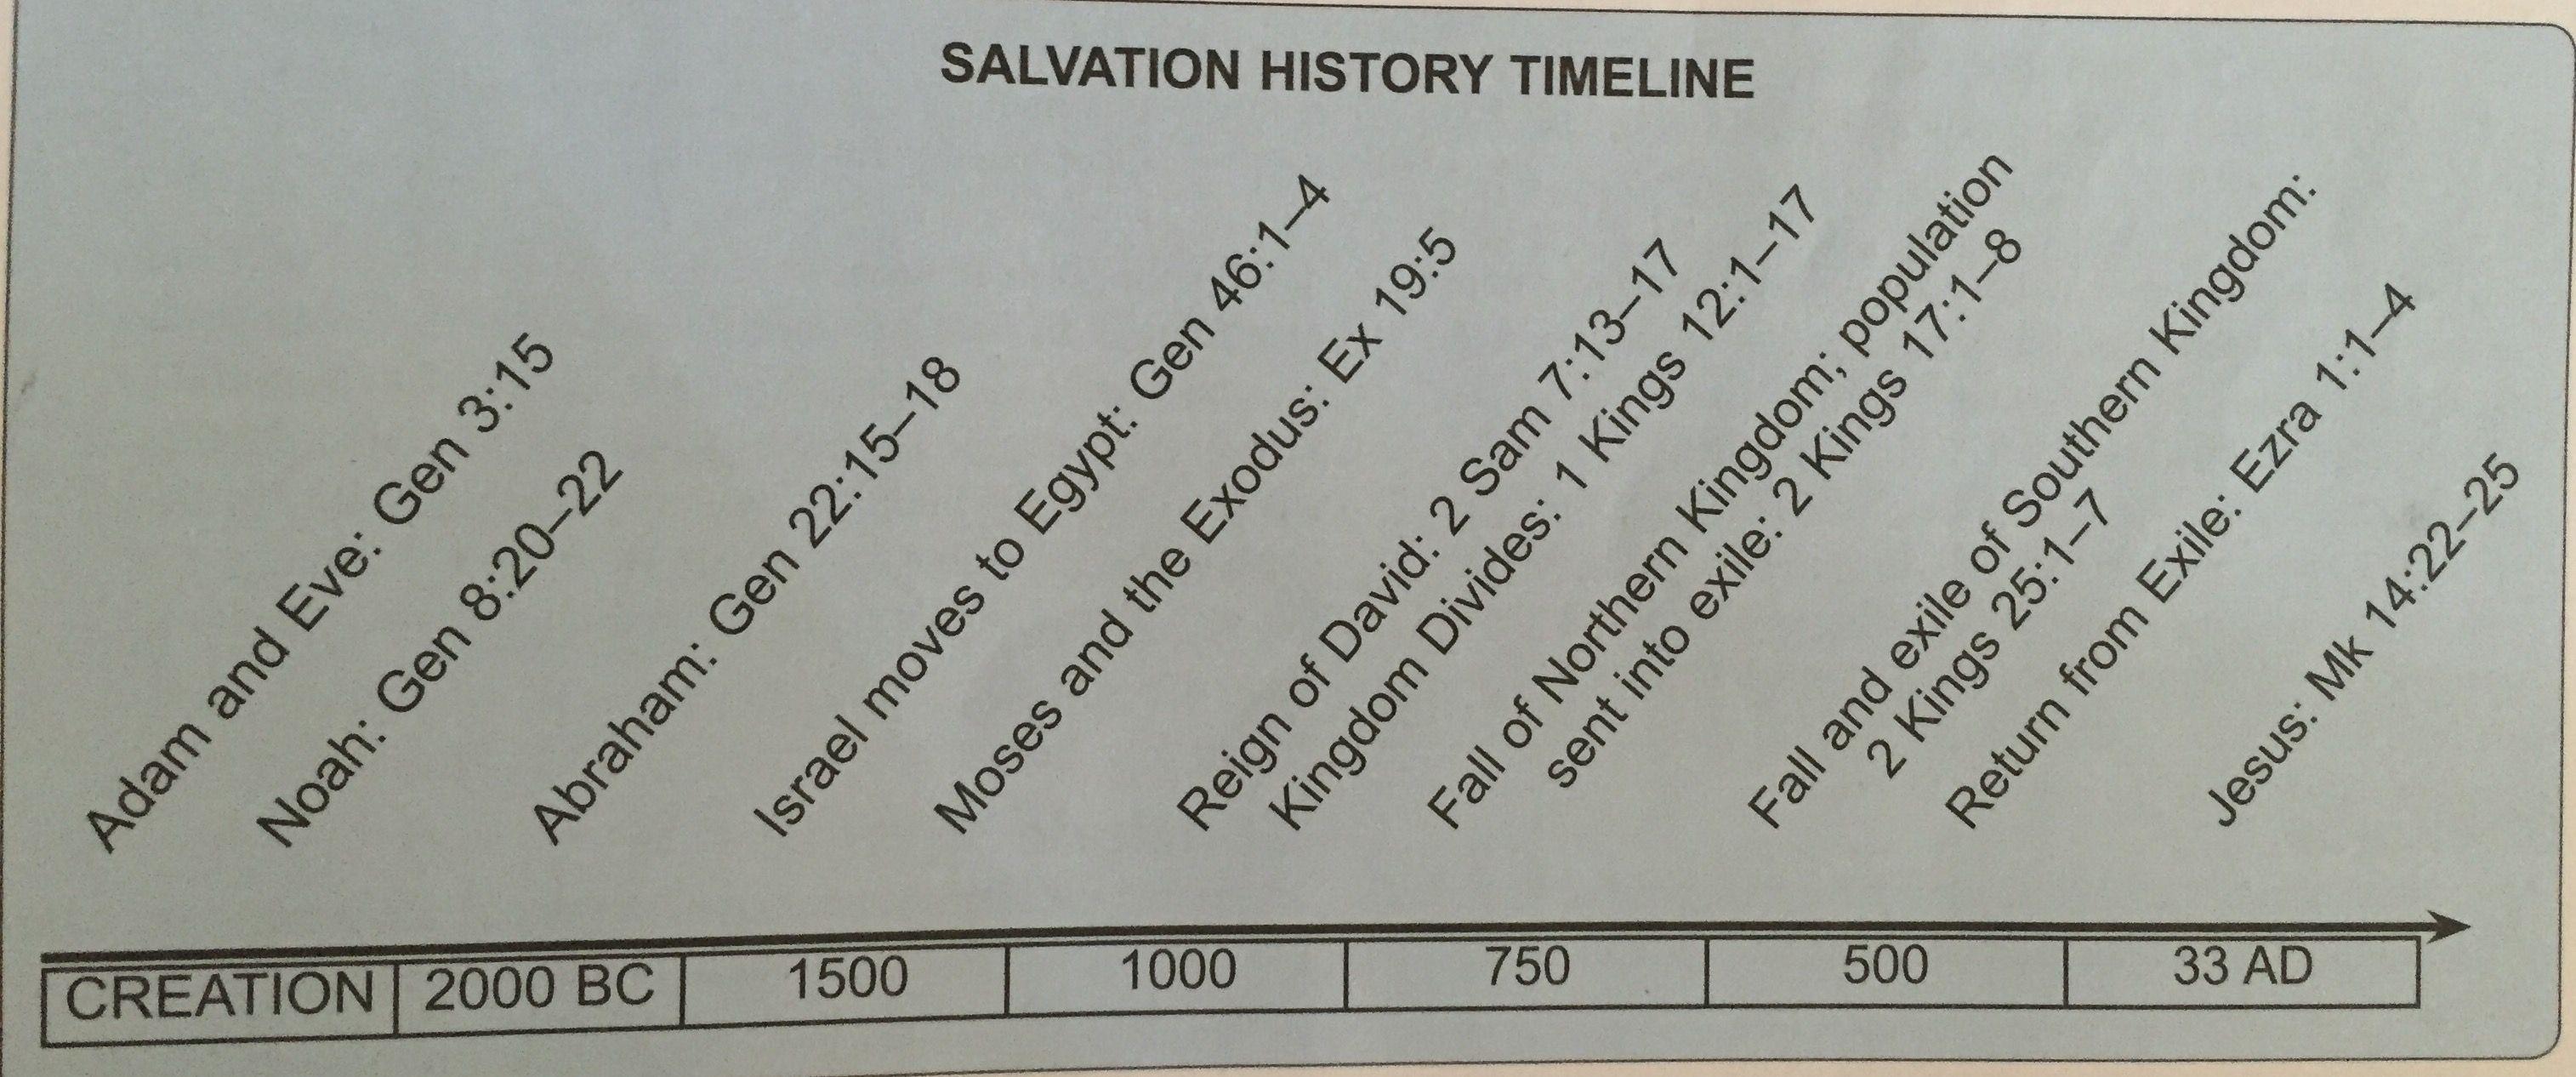 Salvation History Timeline